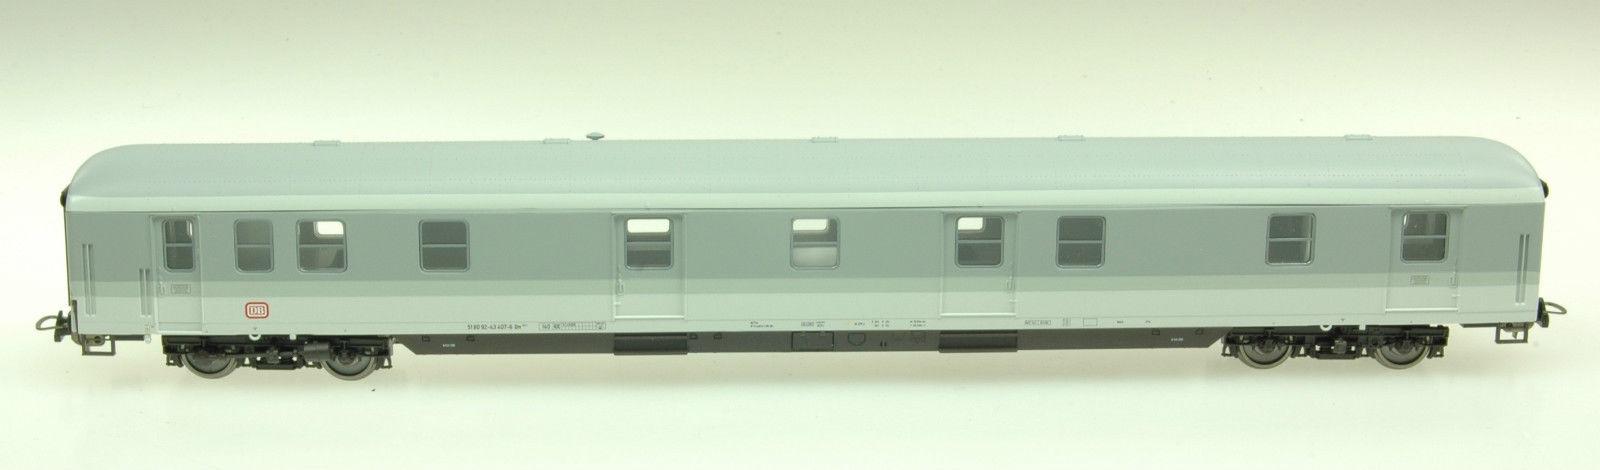 Piko 53384 - Post 019109 - Gepäckwagen Dm 903.1, DB, Ep. IV.1